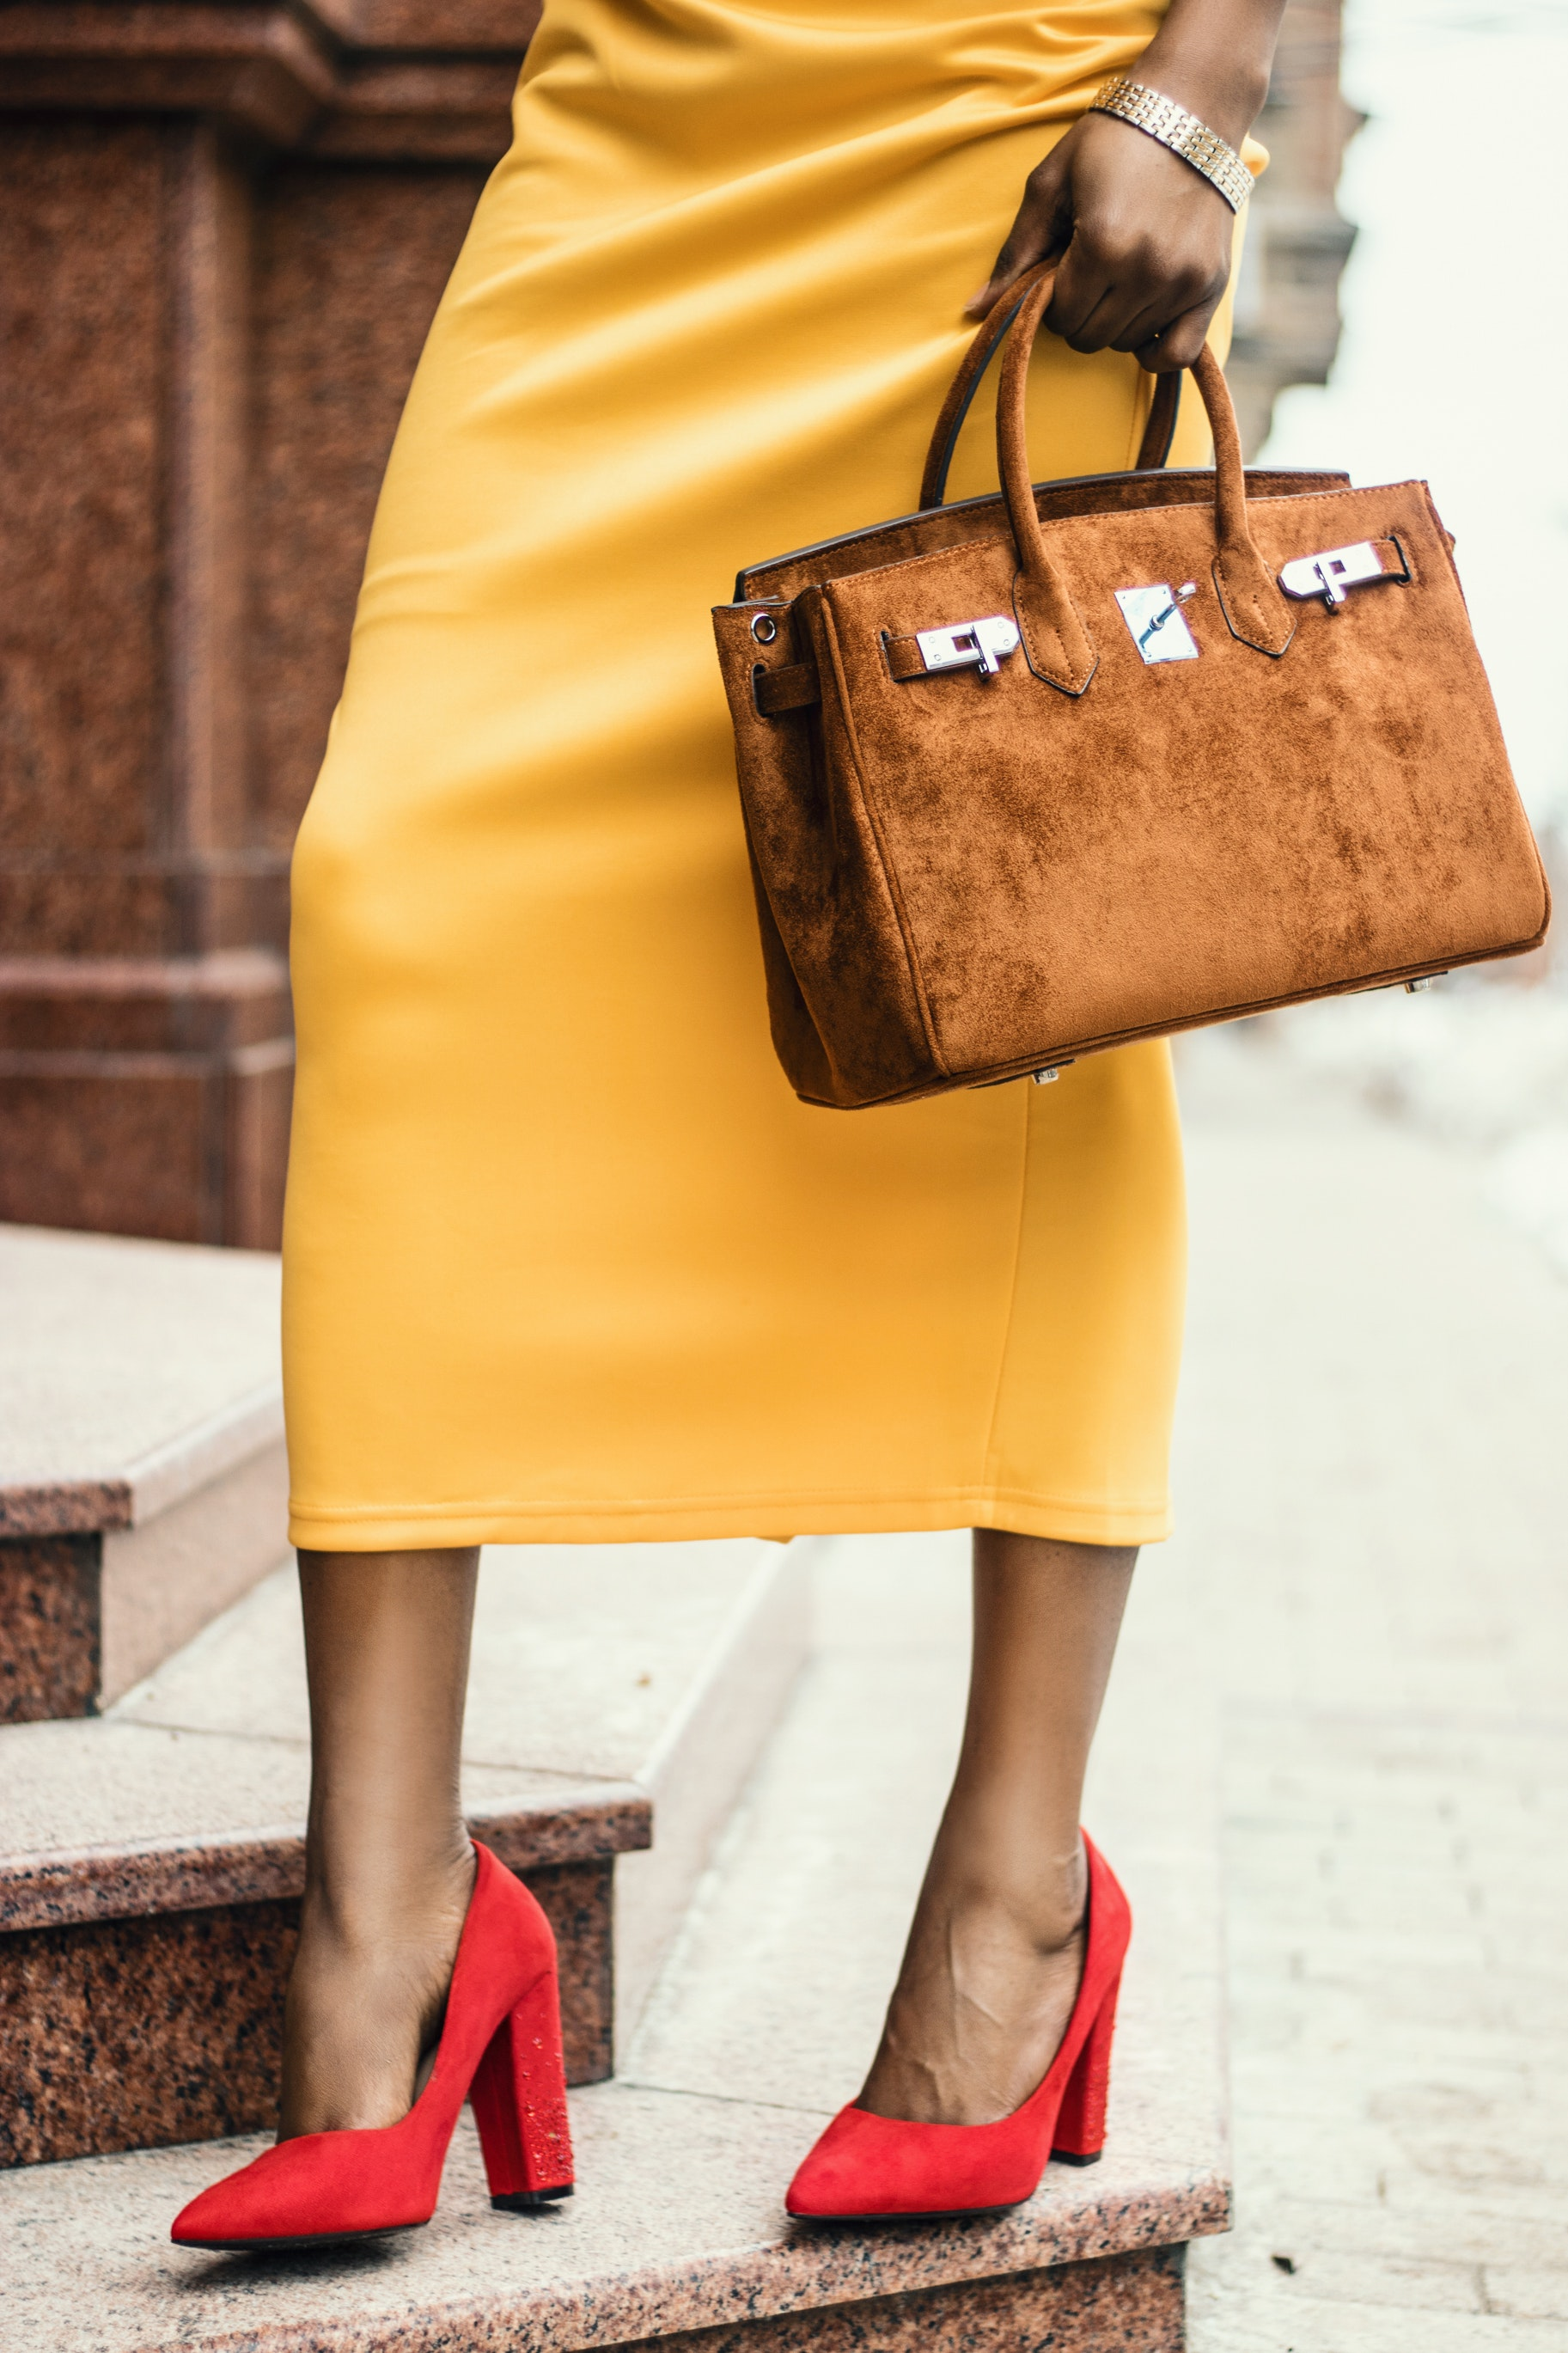 dress-elegant-fashion-1936851.jpg